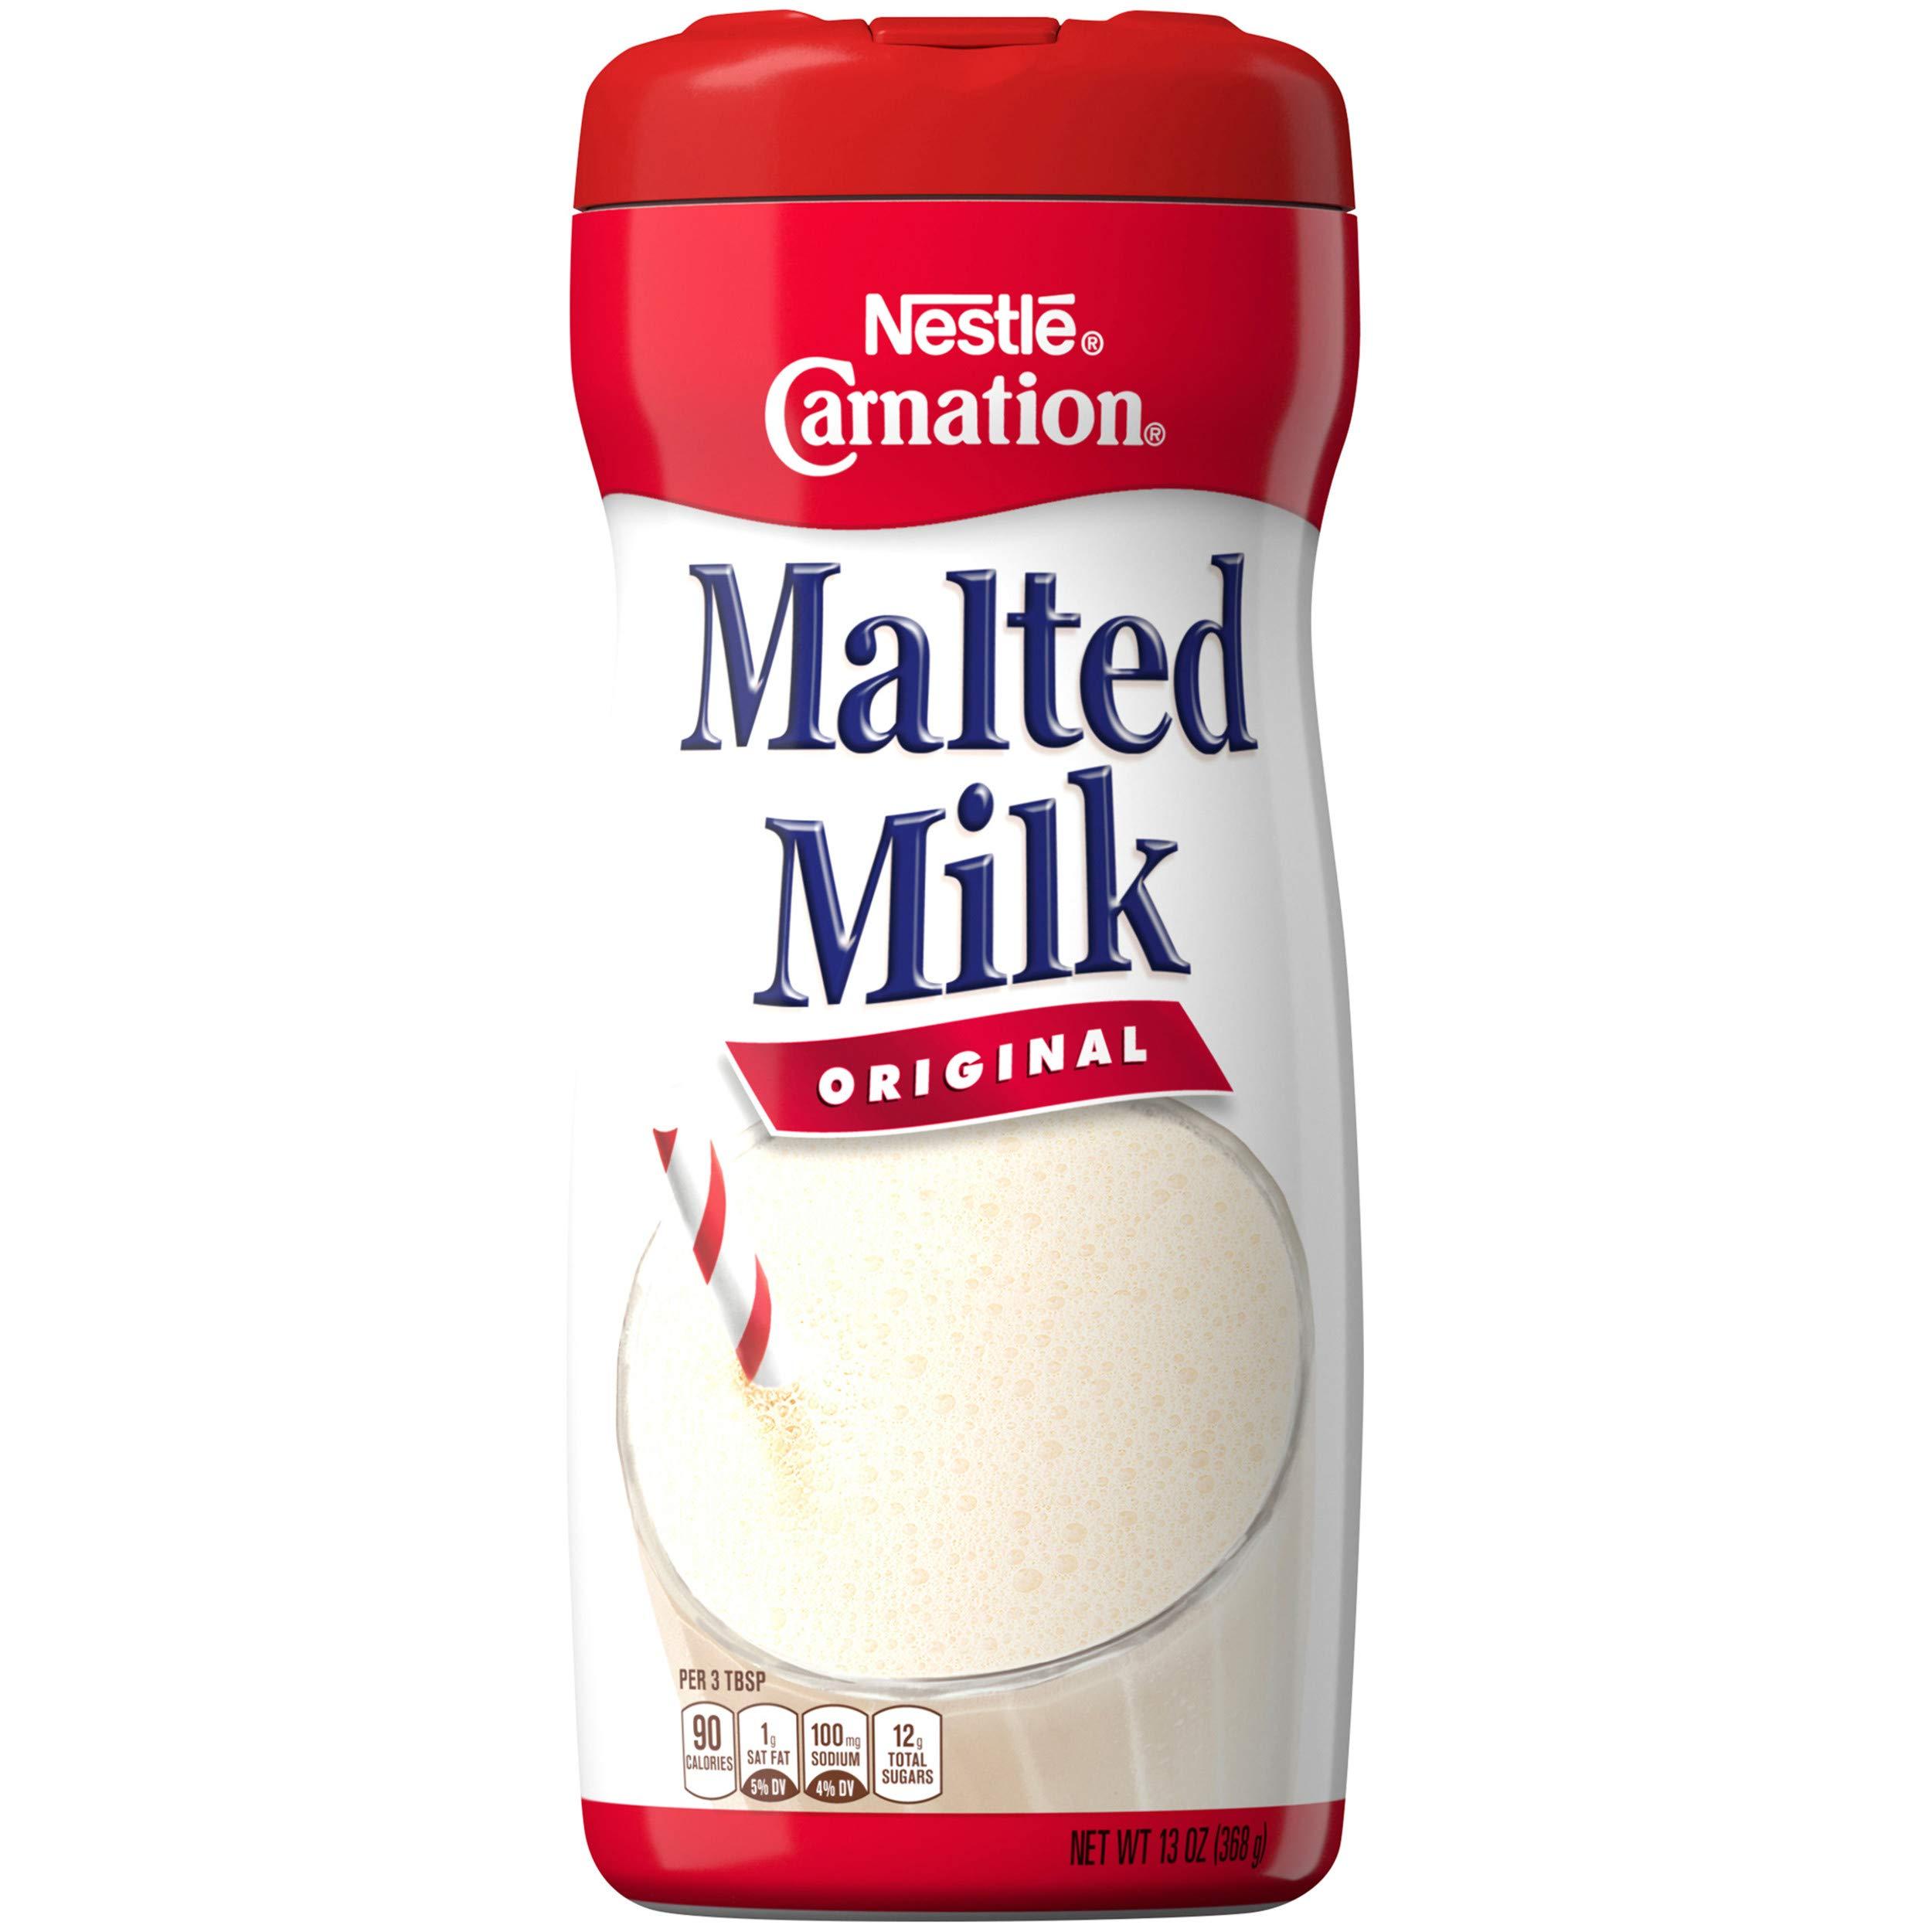 CARNATION Original Malted Milk Mix 13 oz. Canister